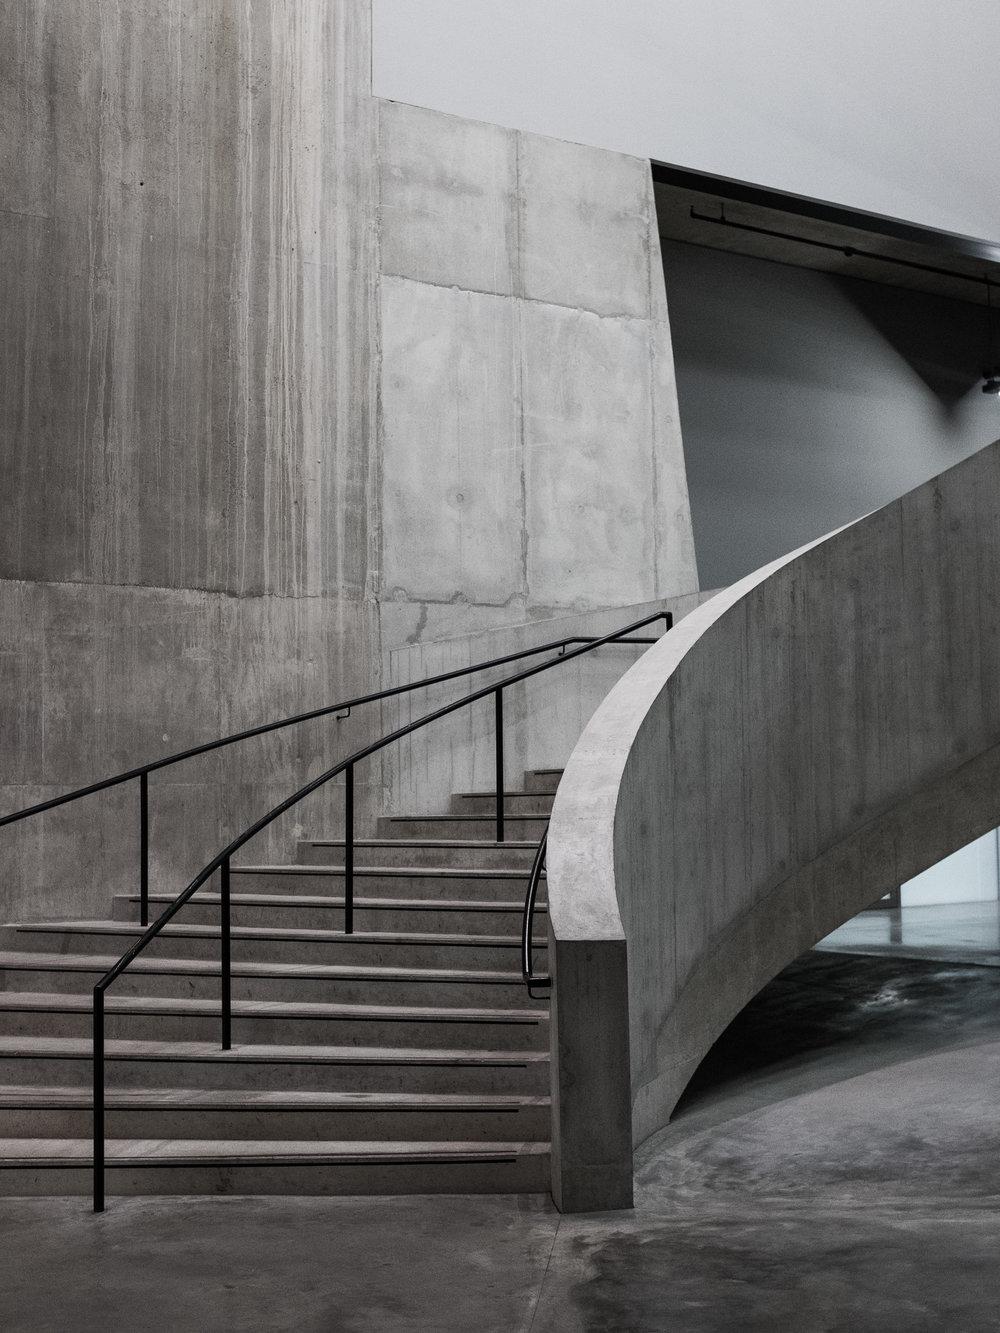 Tate Modern by handover-2.jpg